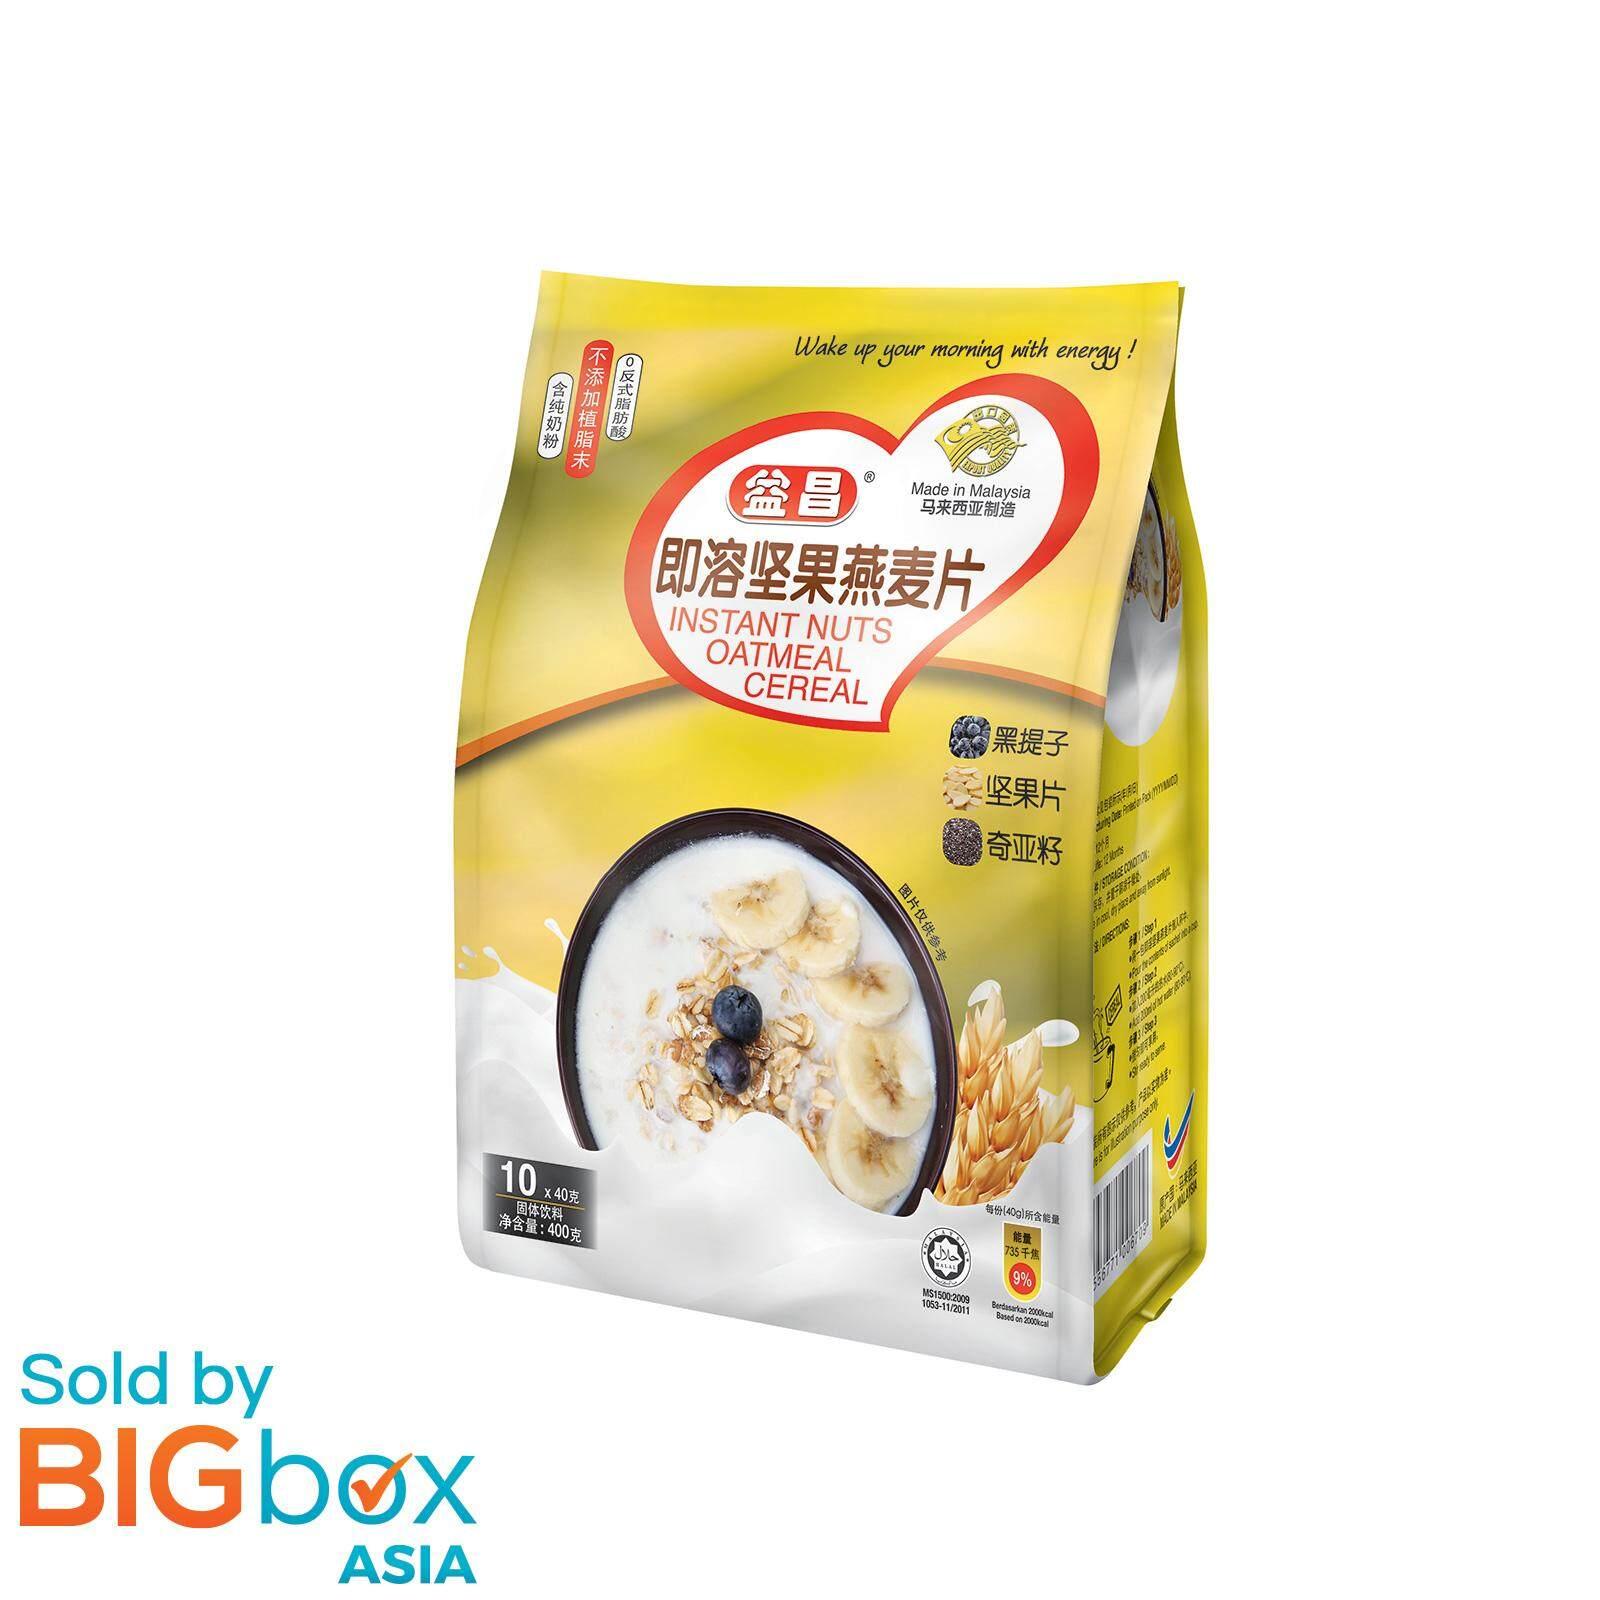 AIK CHEONG Instant Oatmeal 400g (40g x 10 sachets) - Nuts